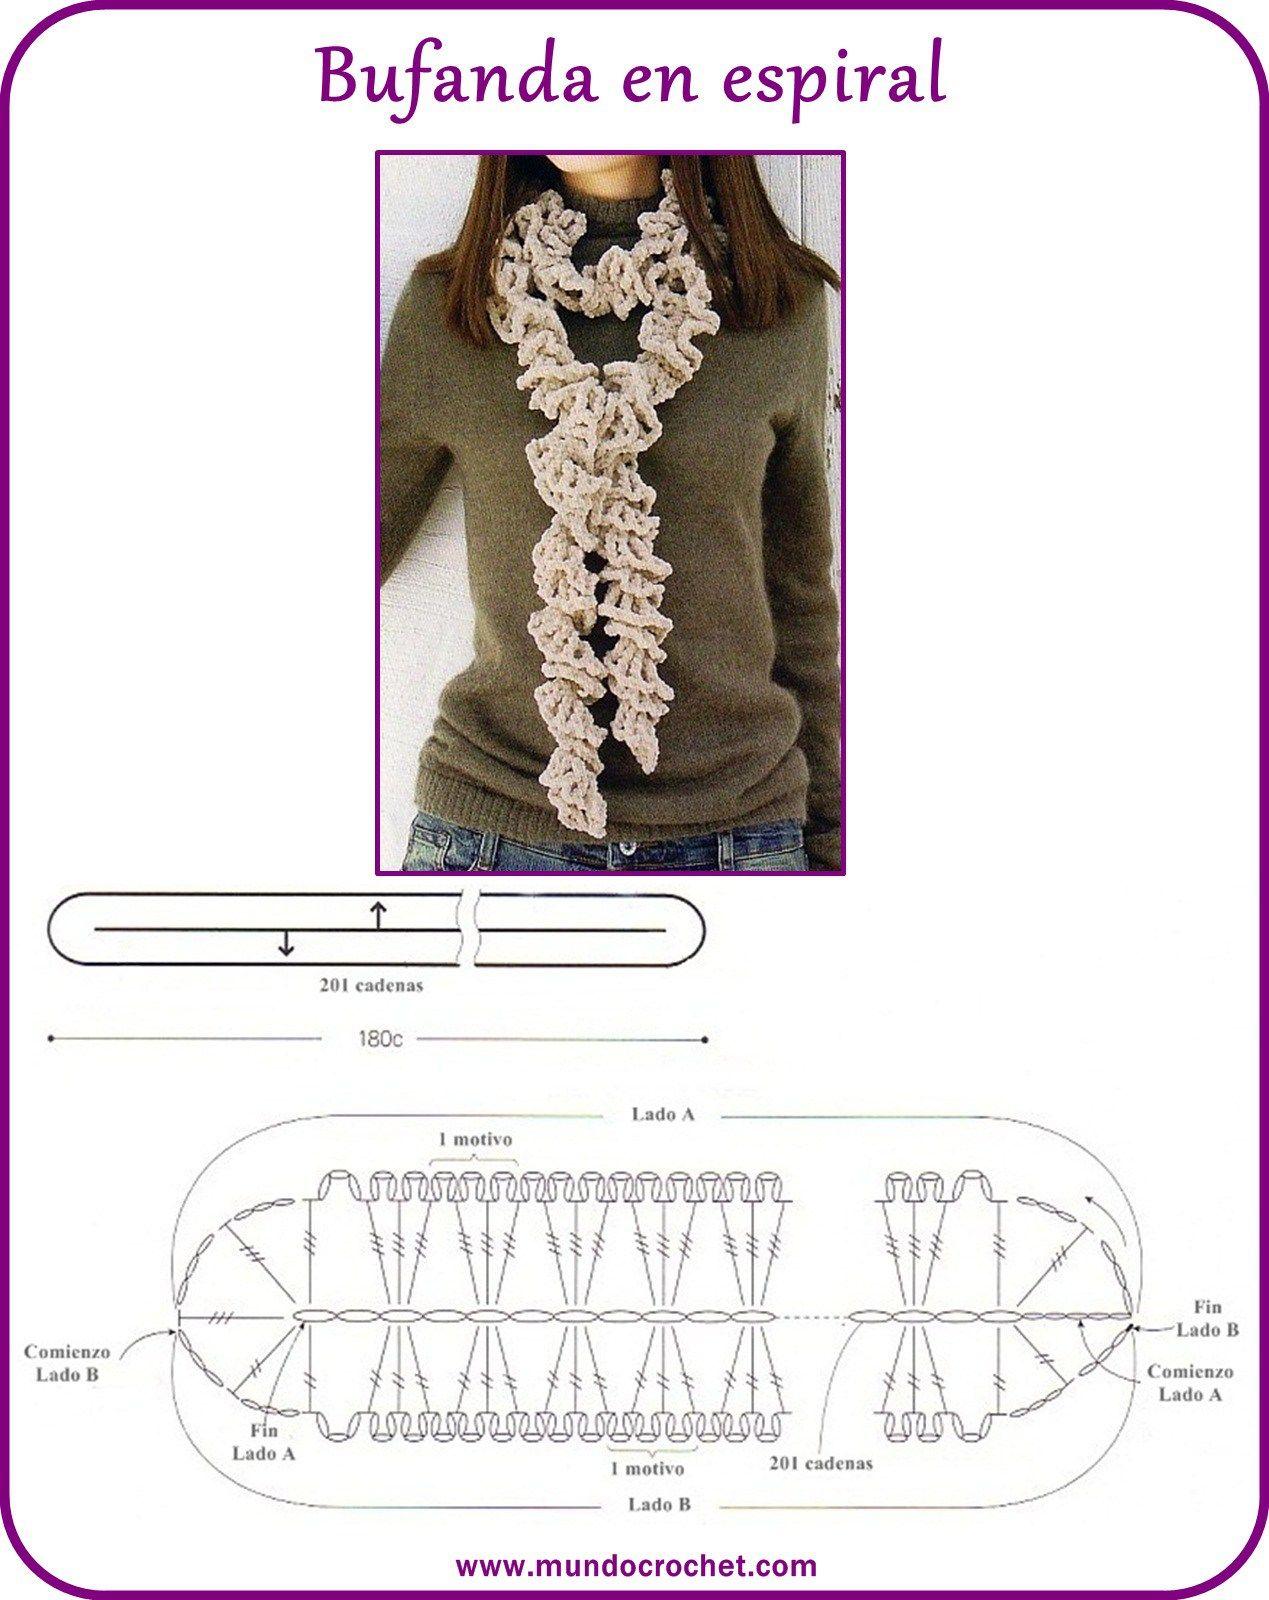 Pin de Liliana Piorno en Crochet | Crochet, Crochet Shawl y Crochet ...